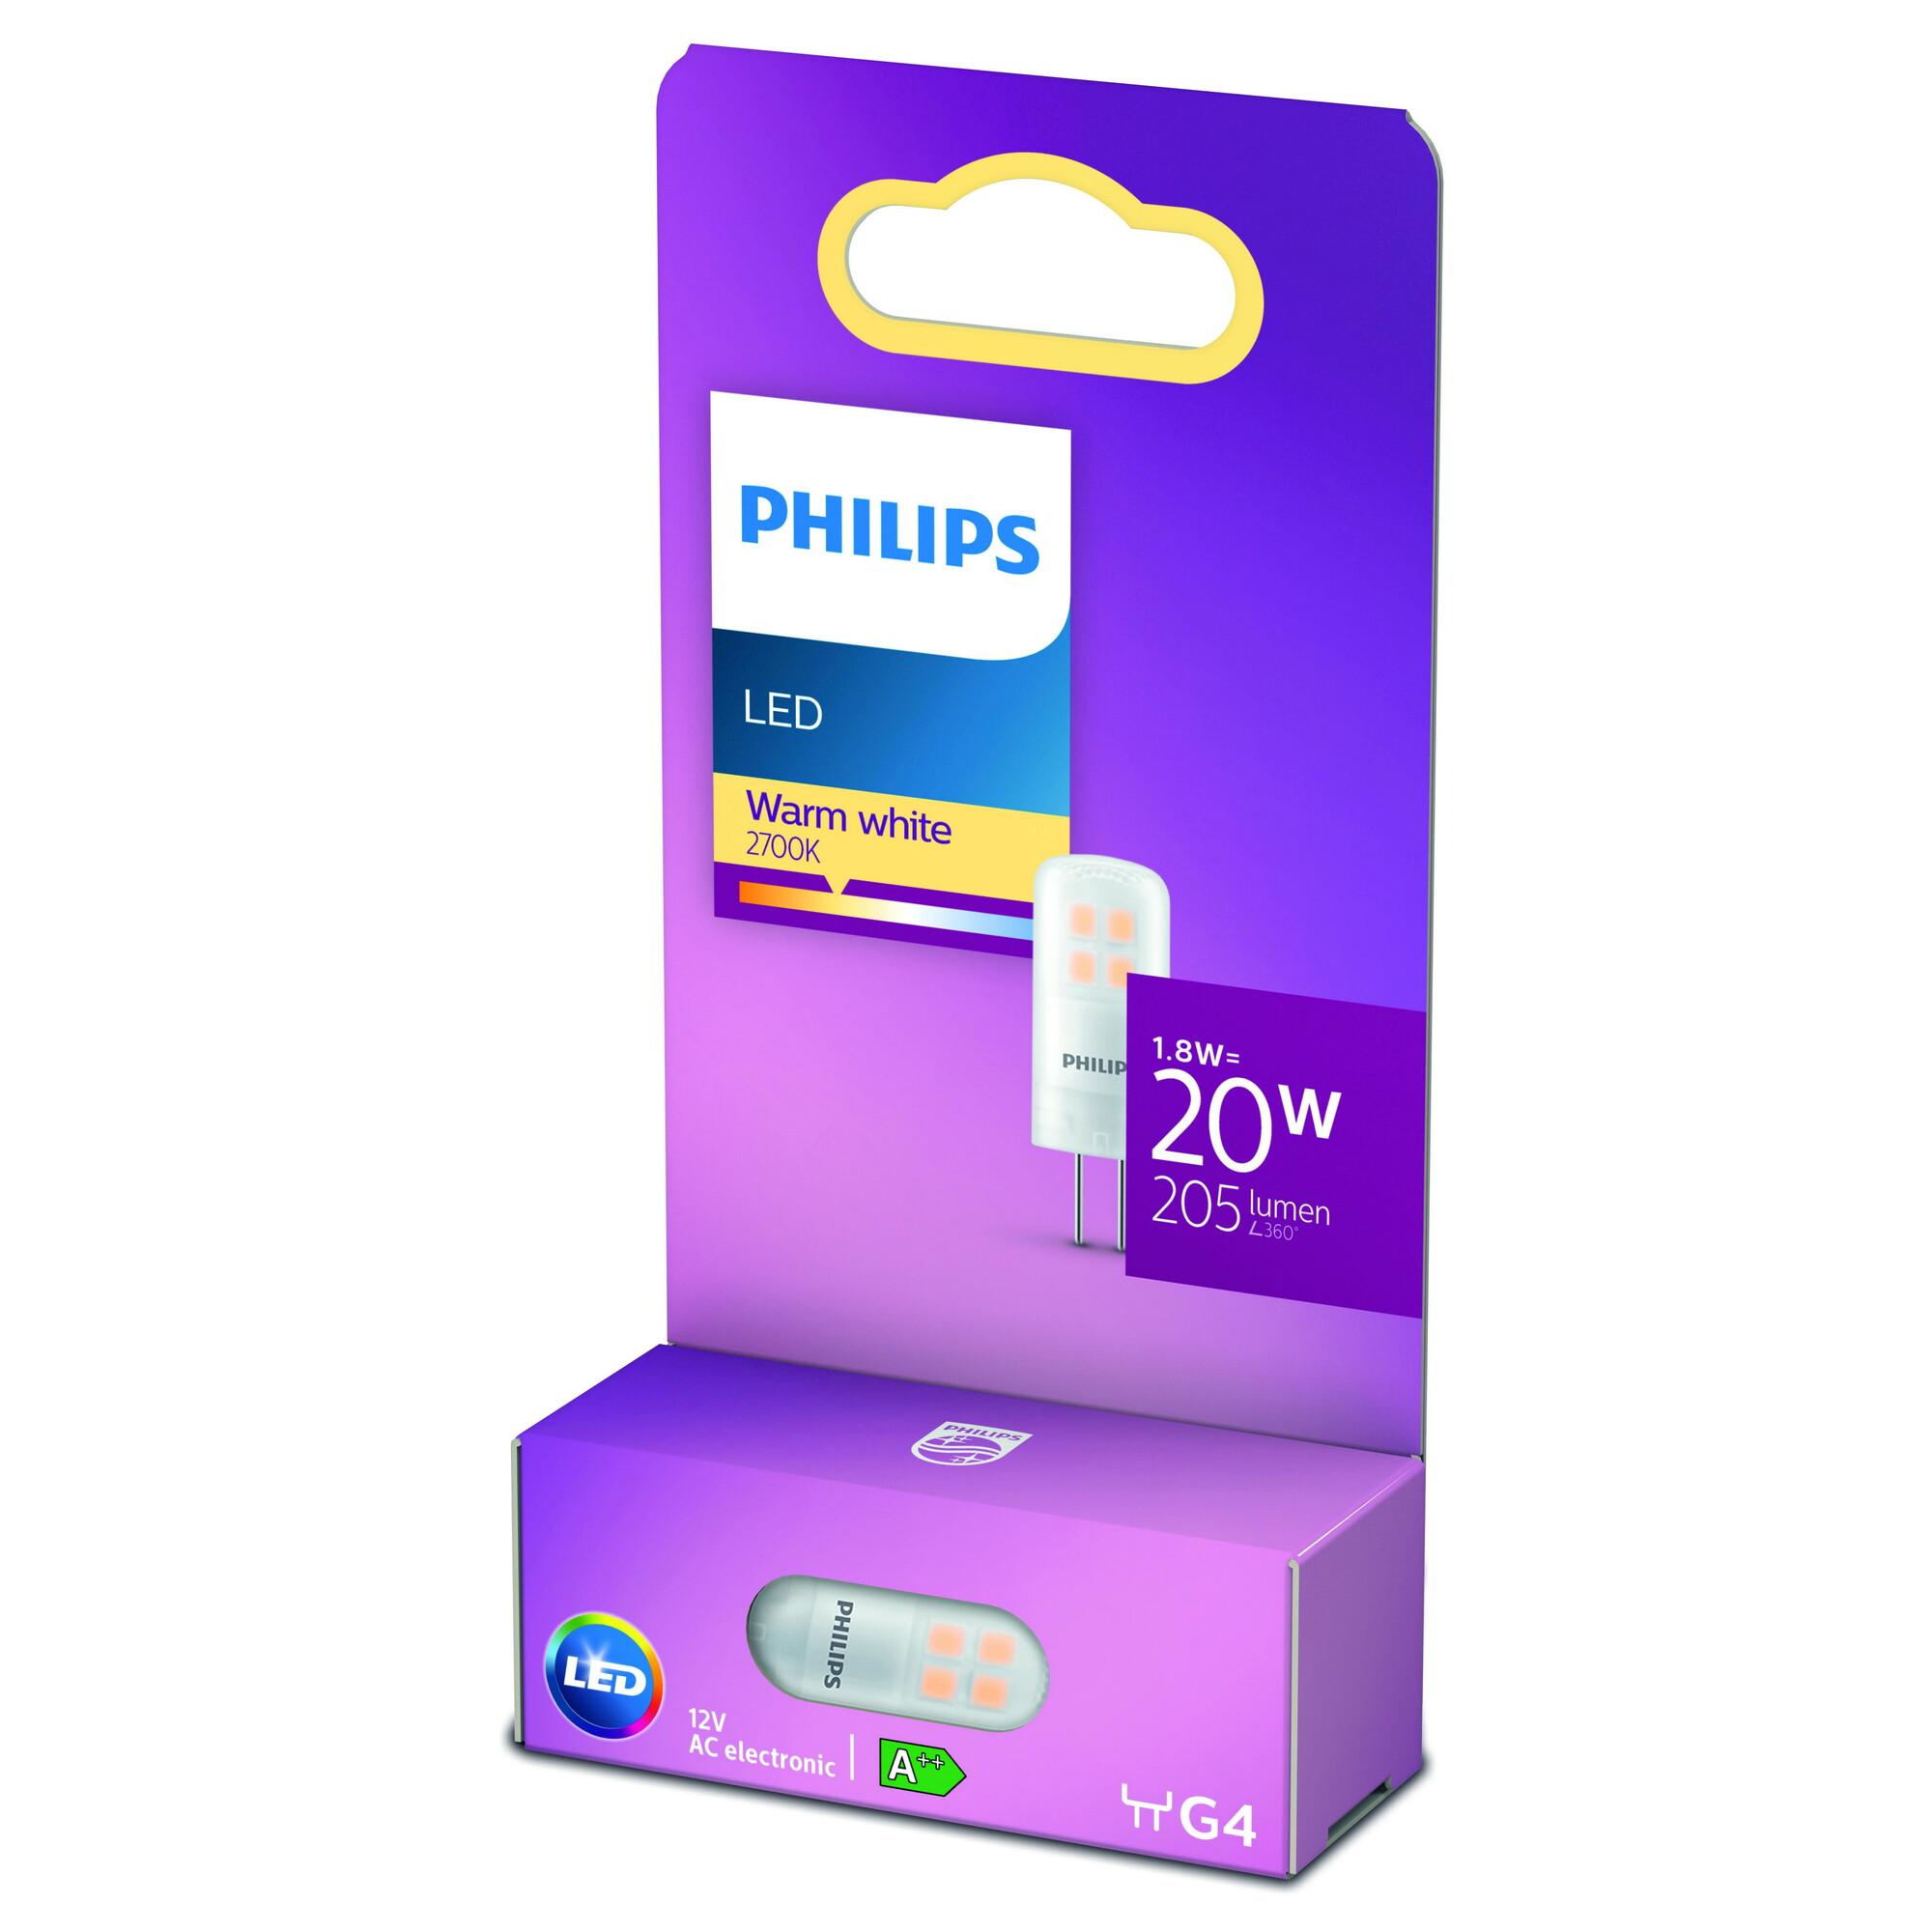 Philips LED G4 1,8W 205lm 2700K Capsule Transparant